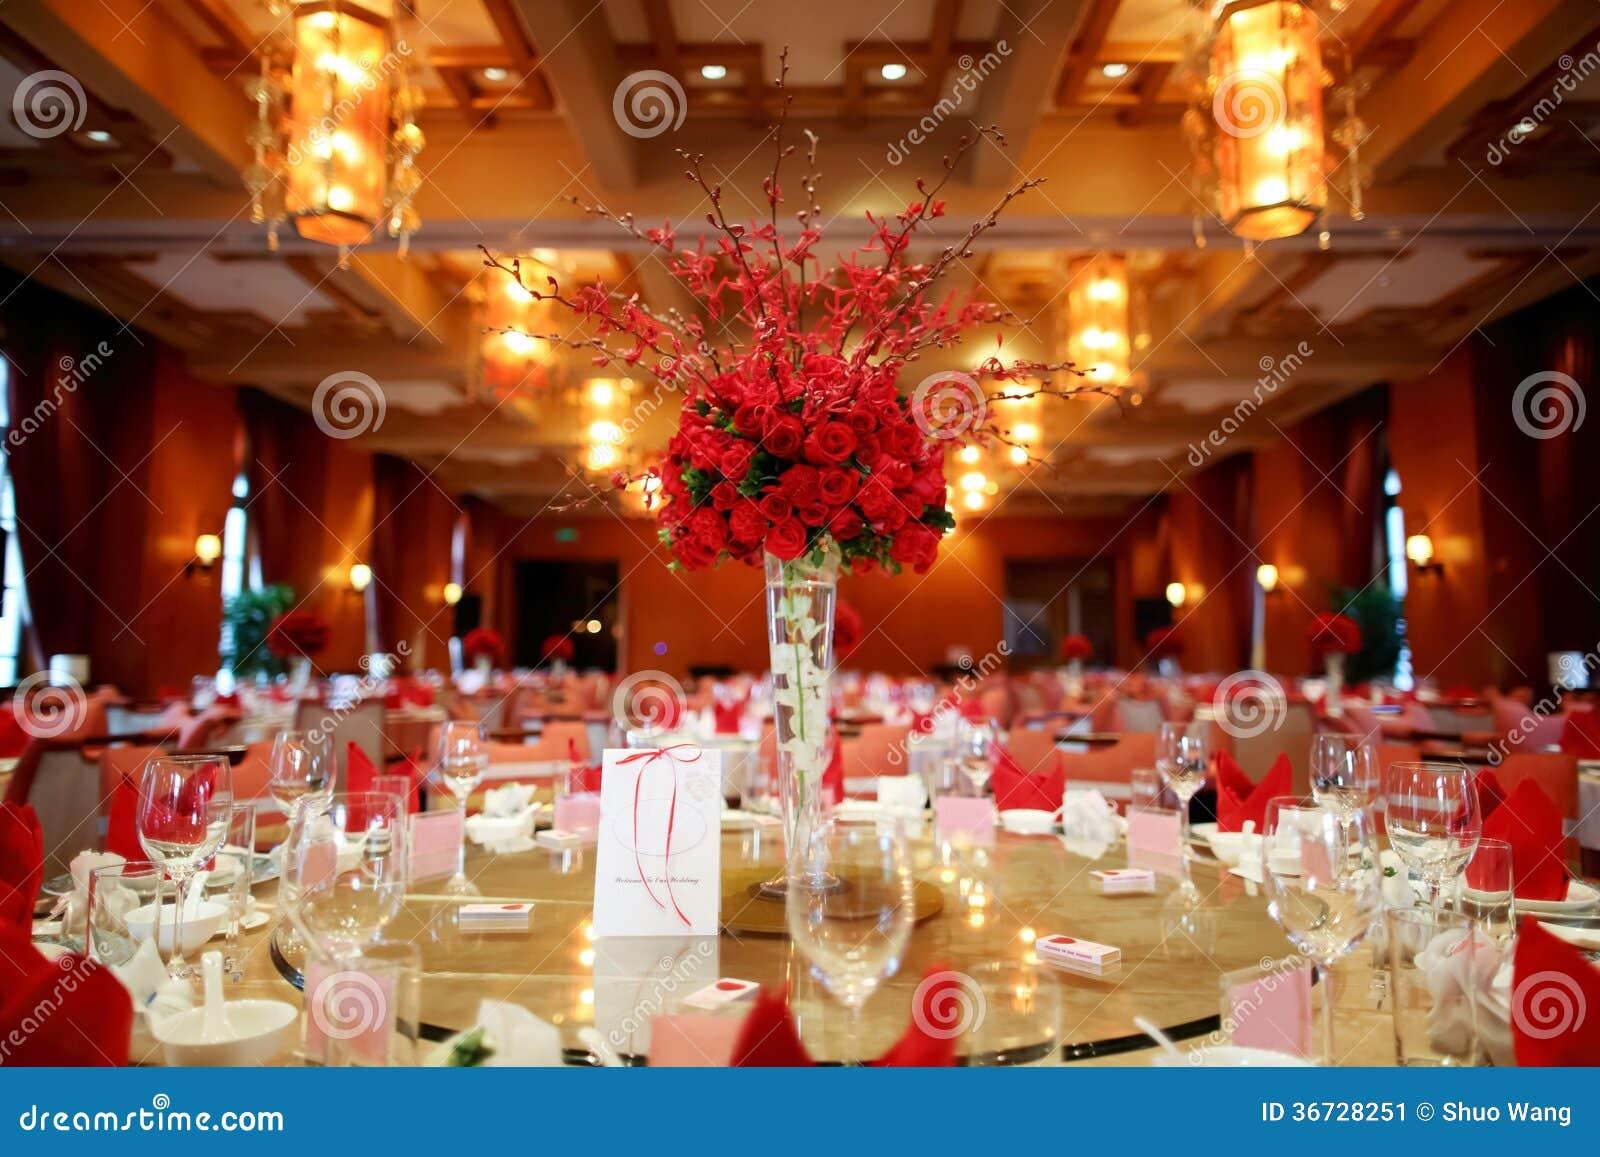 Indoor Wedding Scene Stock Image - Image: 36728251